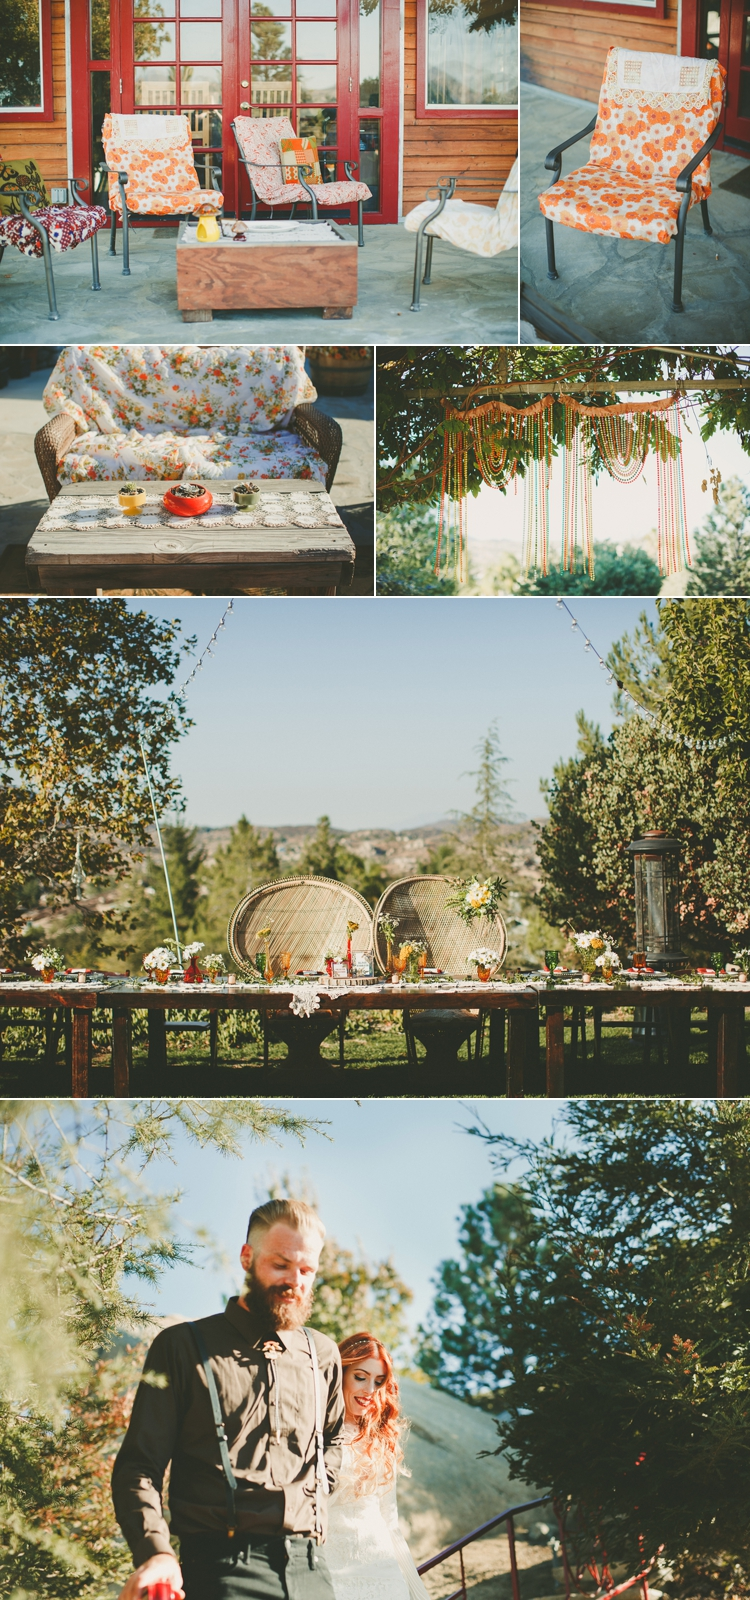 woodstock-inspired-wedding-photos-19